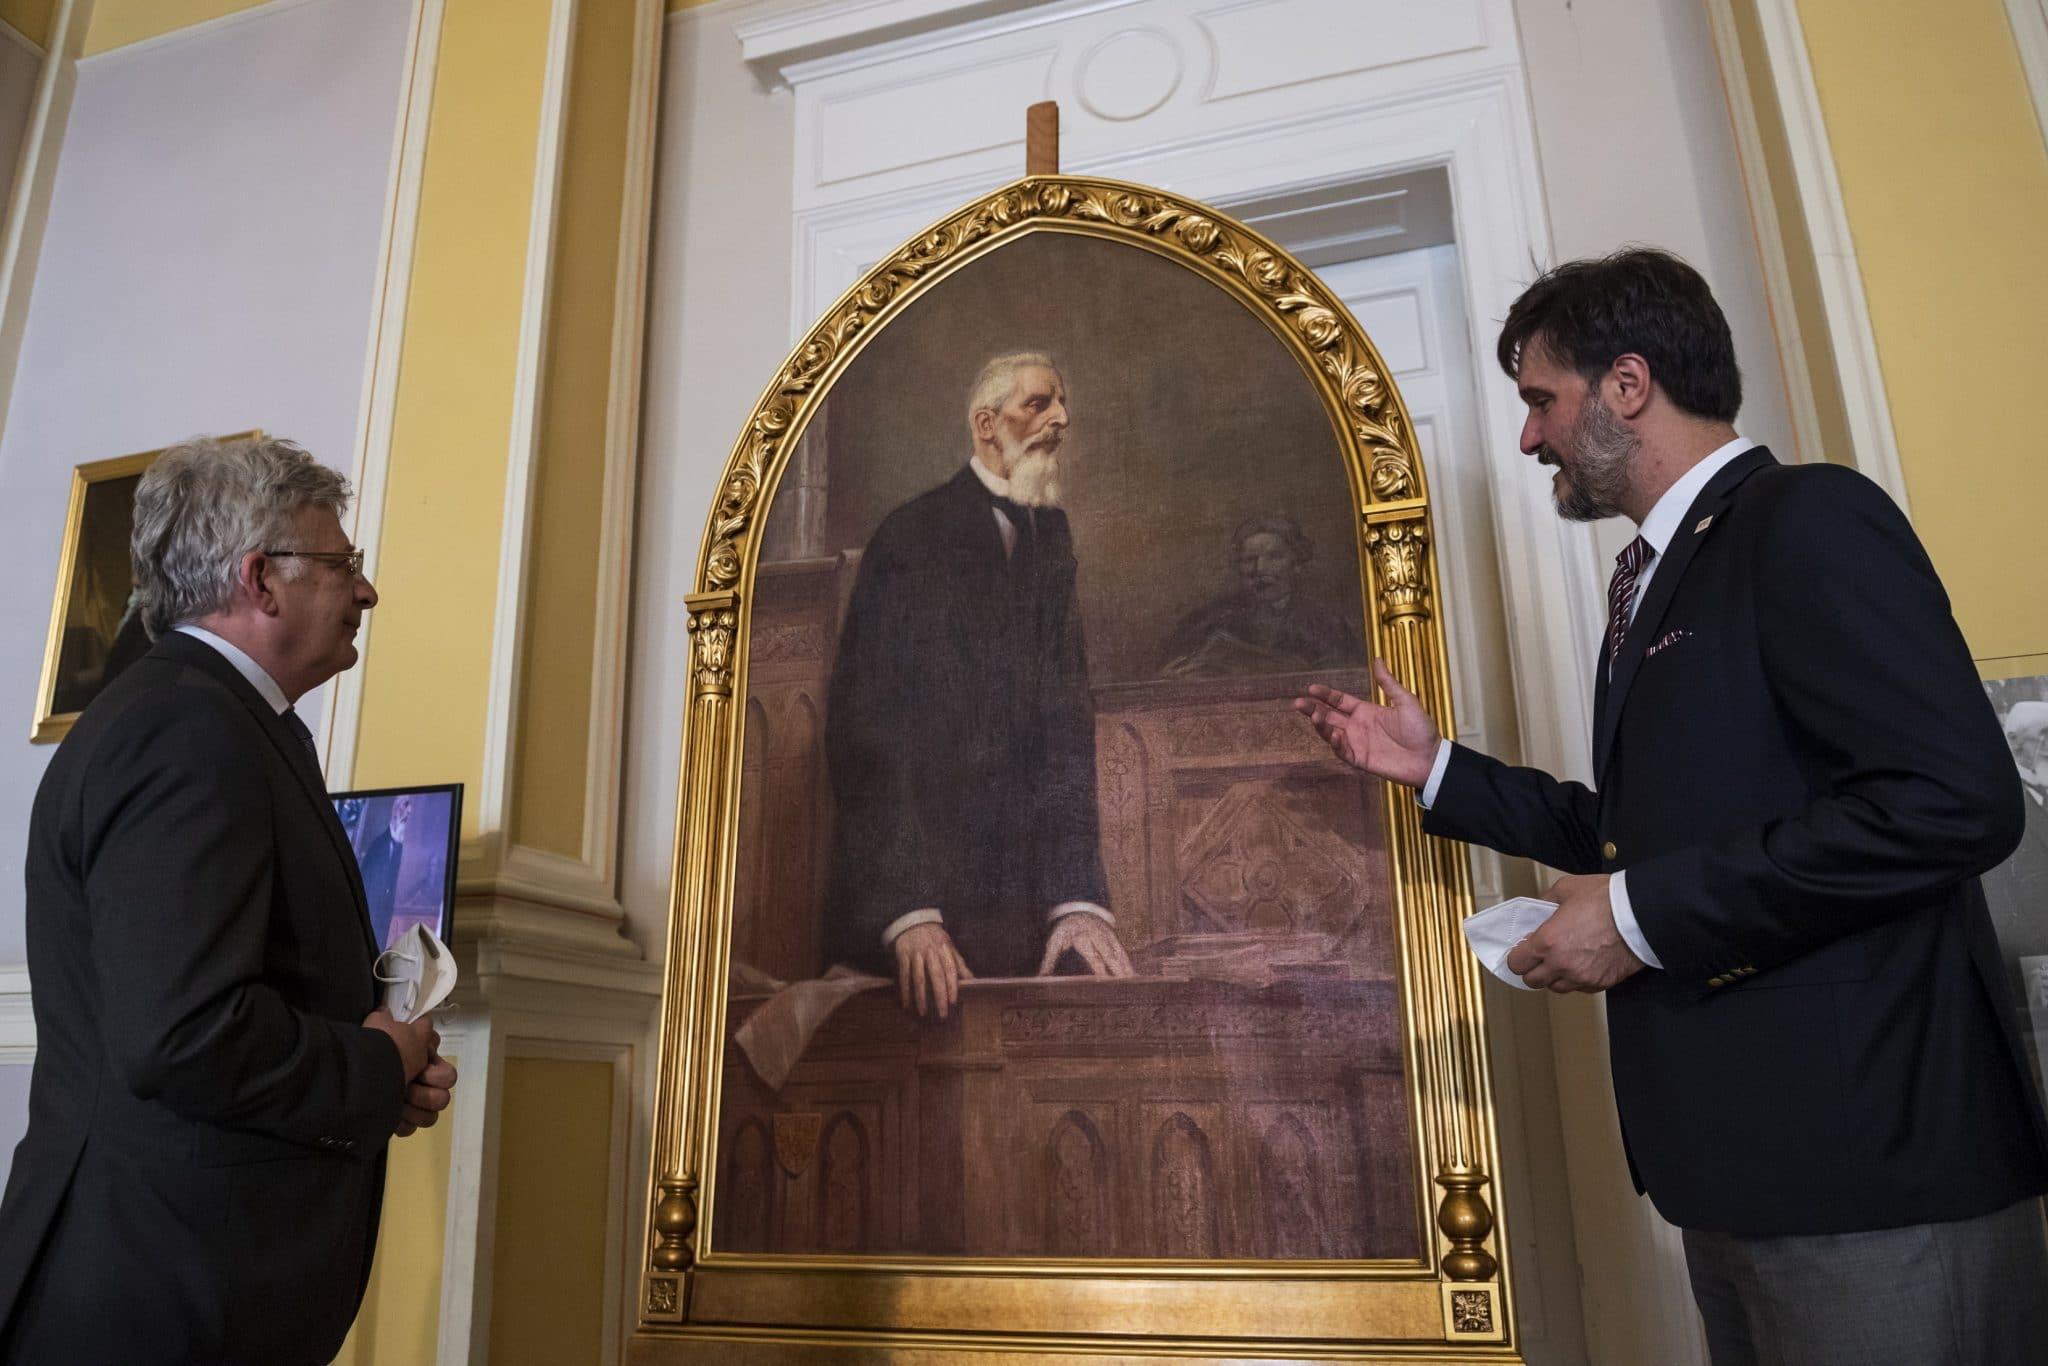 apponyi-albert-magyar-nemzeti-muzeum-festmeny-kamaratarlat